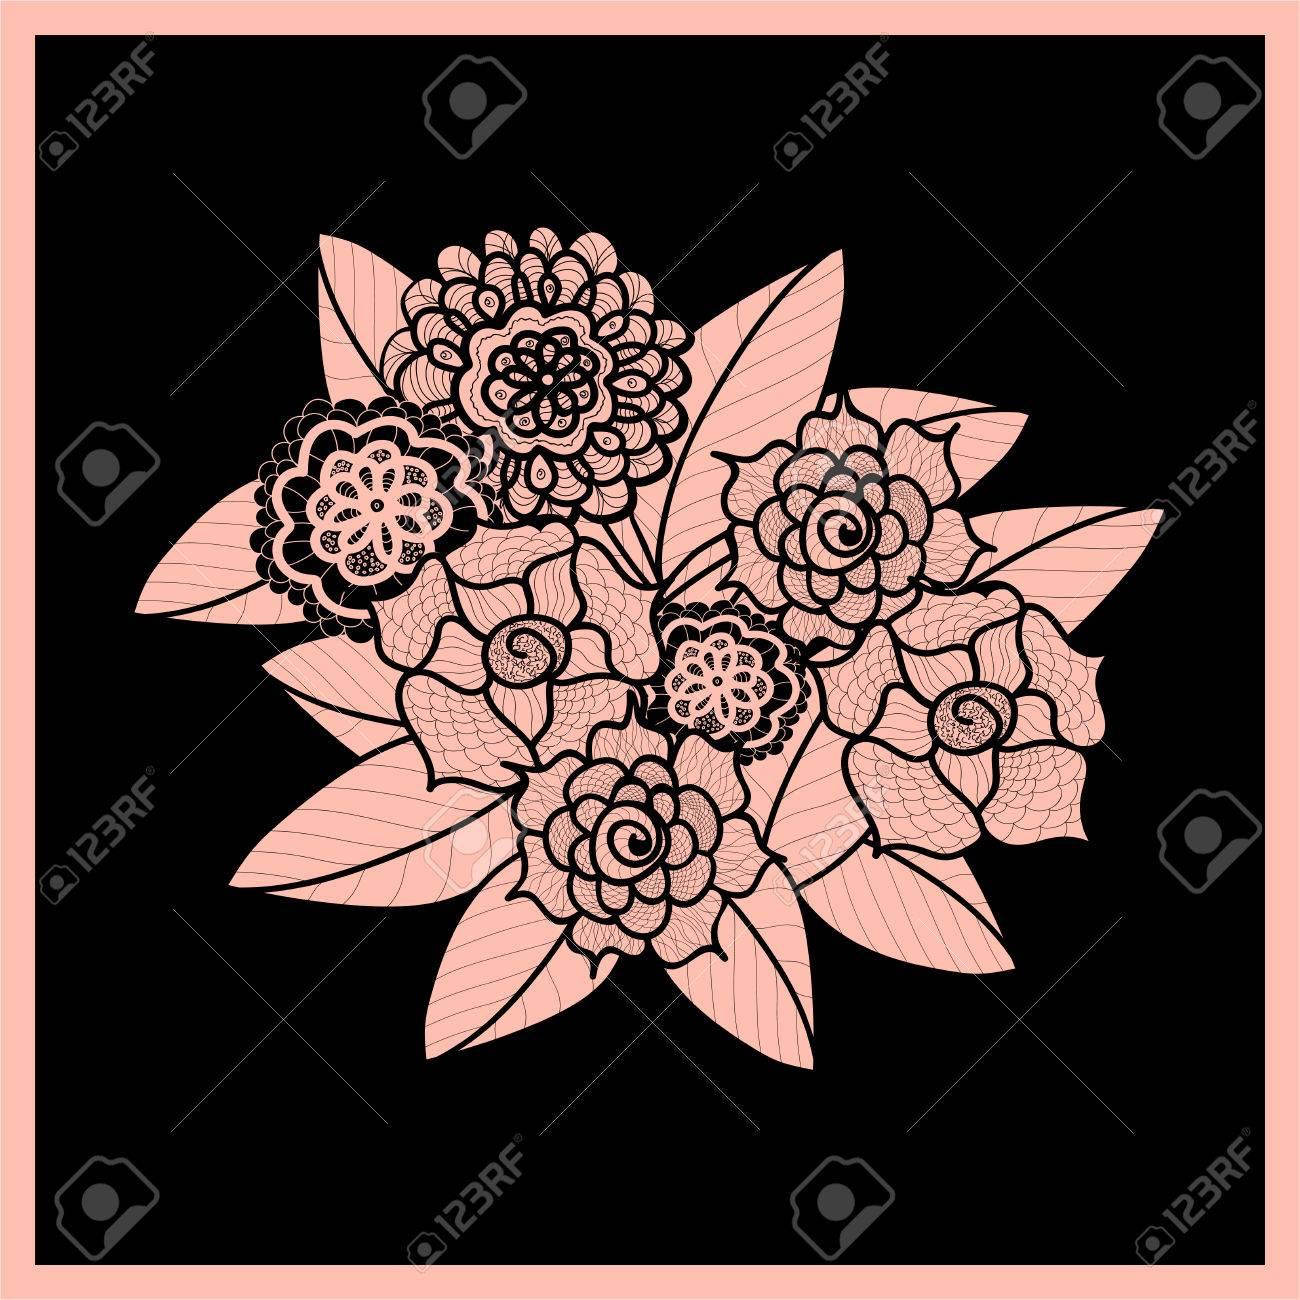 schne gekritzelkunst blumen zentangle muster handkruter design element gezogen floral schwarz und - Zentangle Muster